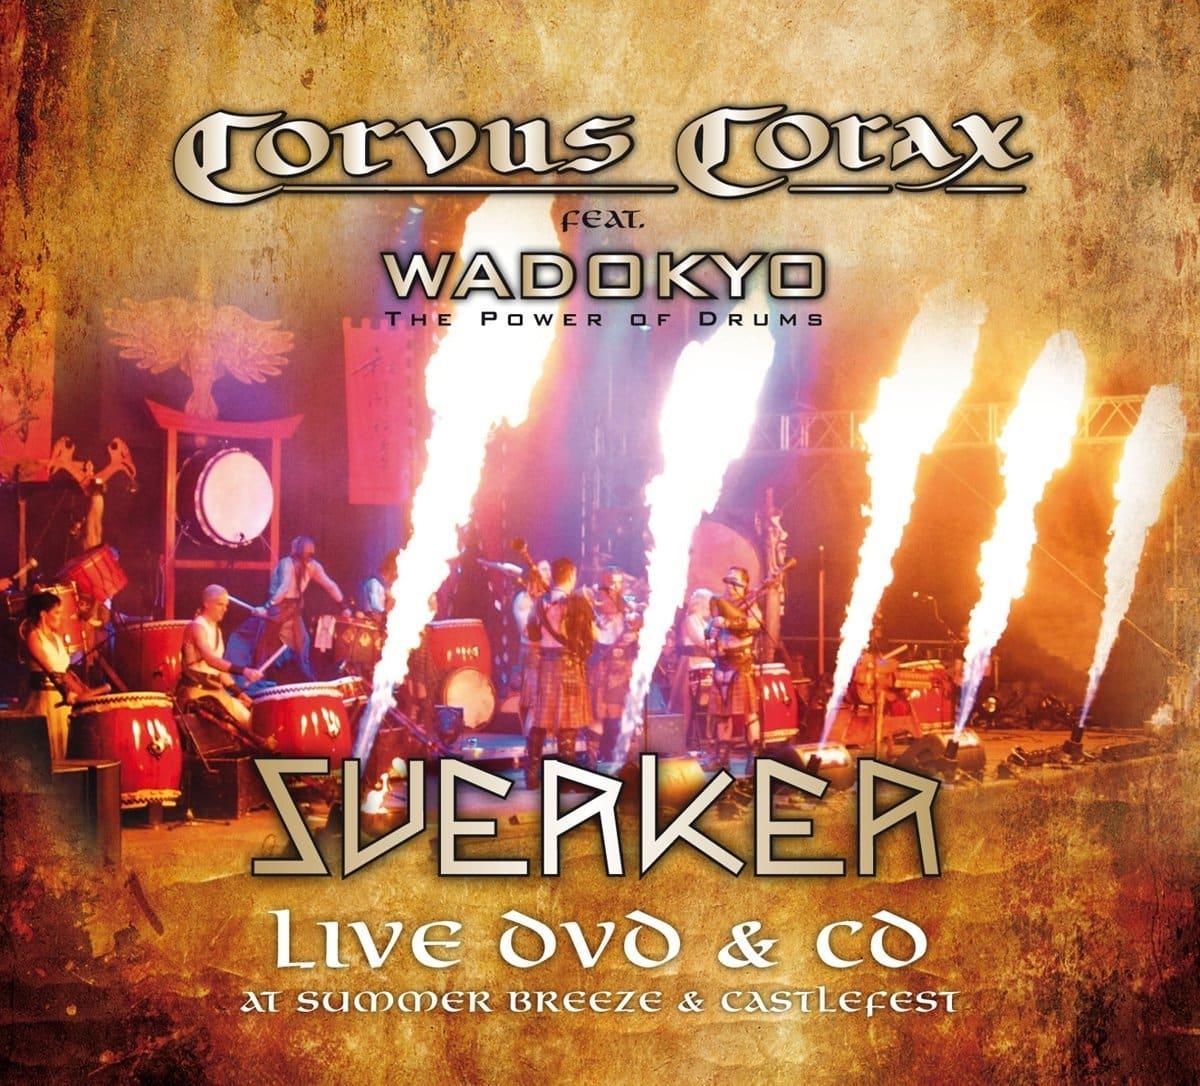 DVD Review: Corvus Corax - Sverker Live